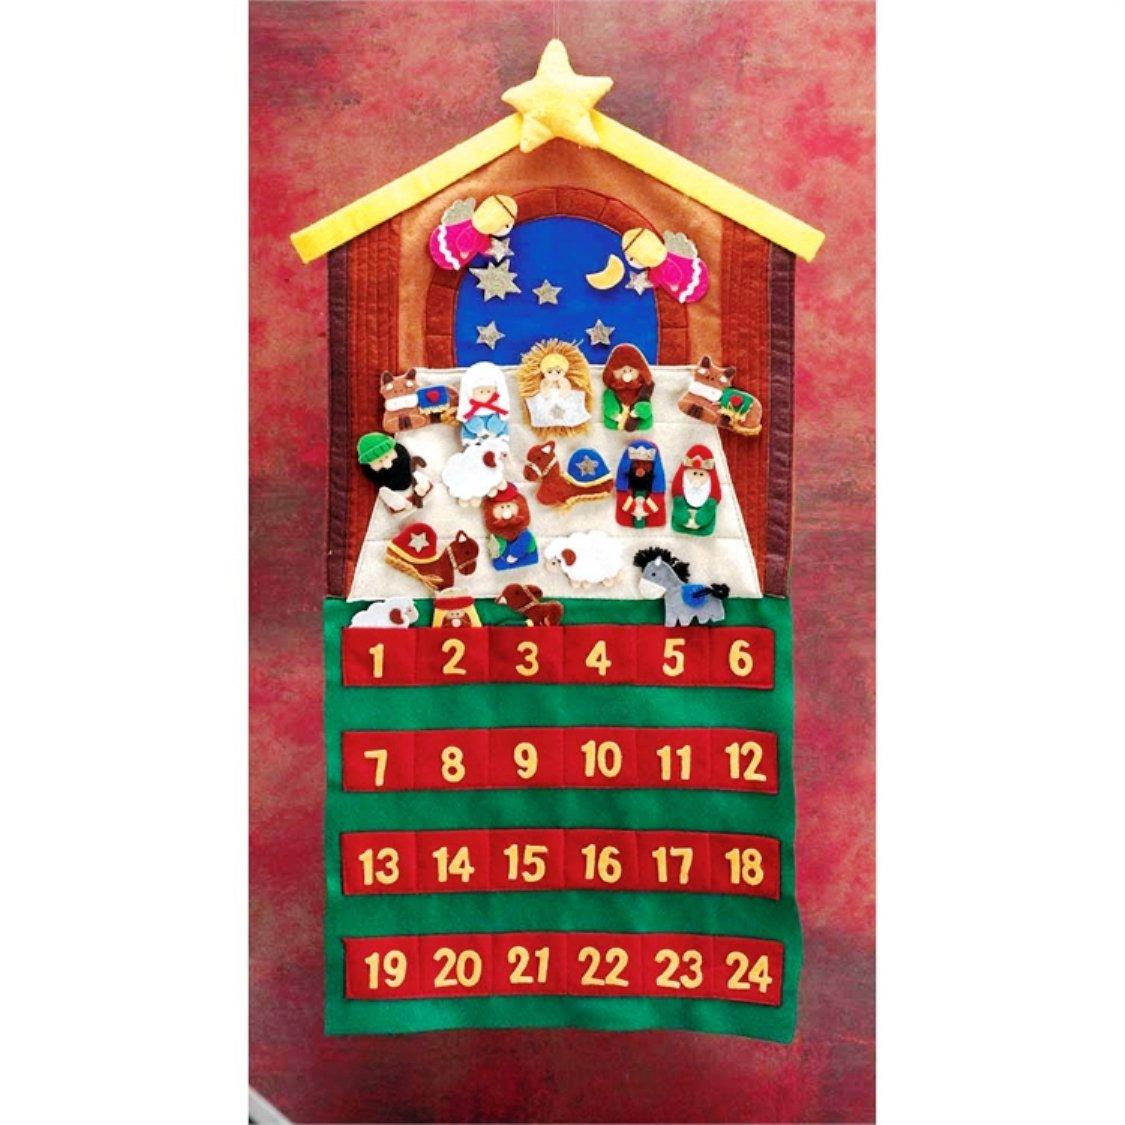 Nativity Theme Crimson, Gold Tone and Fern 12 x 29 Felt 24-Piece Children's Advent Calendar Gold Tone and Fern 12 x 29 Felt 24-Piece Children's Advent Calendar Dicksons